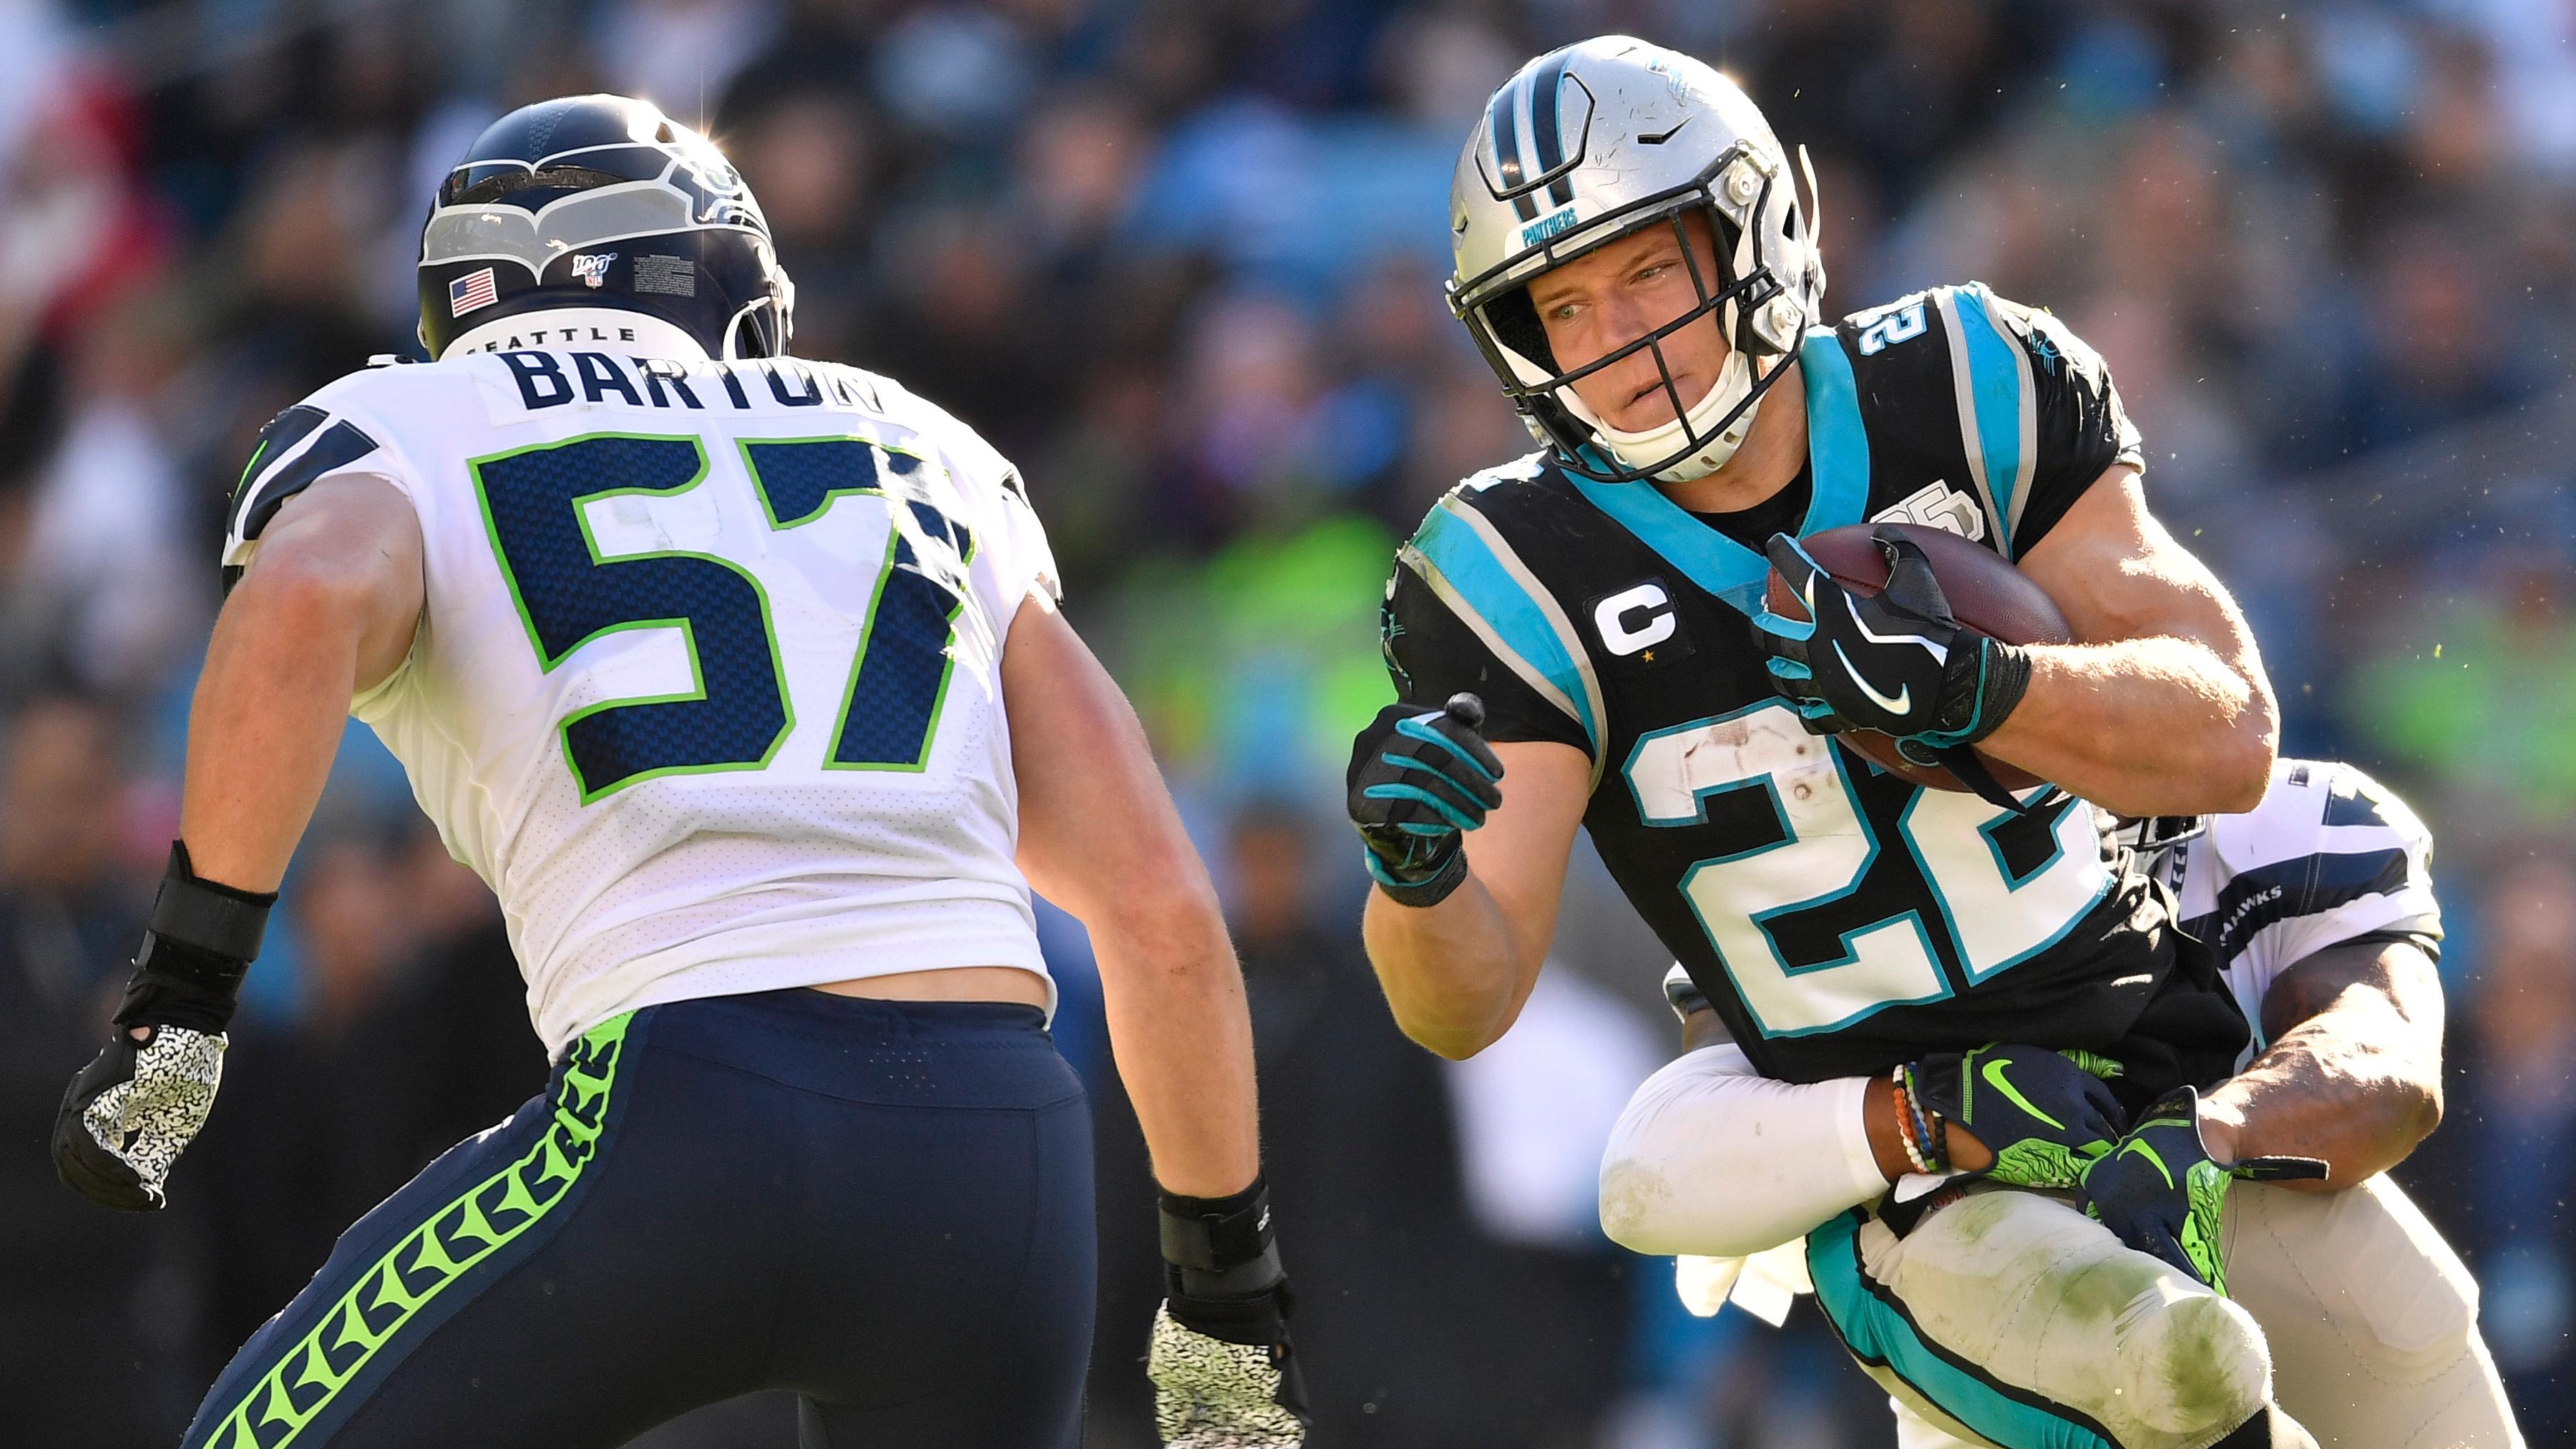 Despite McCaffrey's performance, Panthers fall short to Seahawks